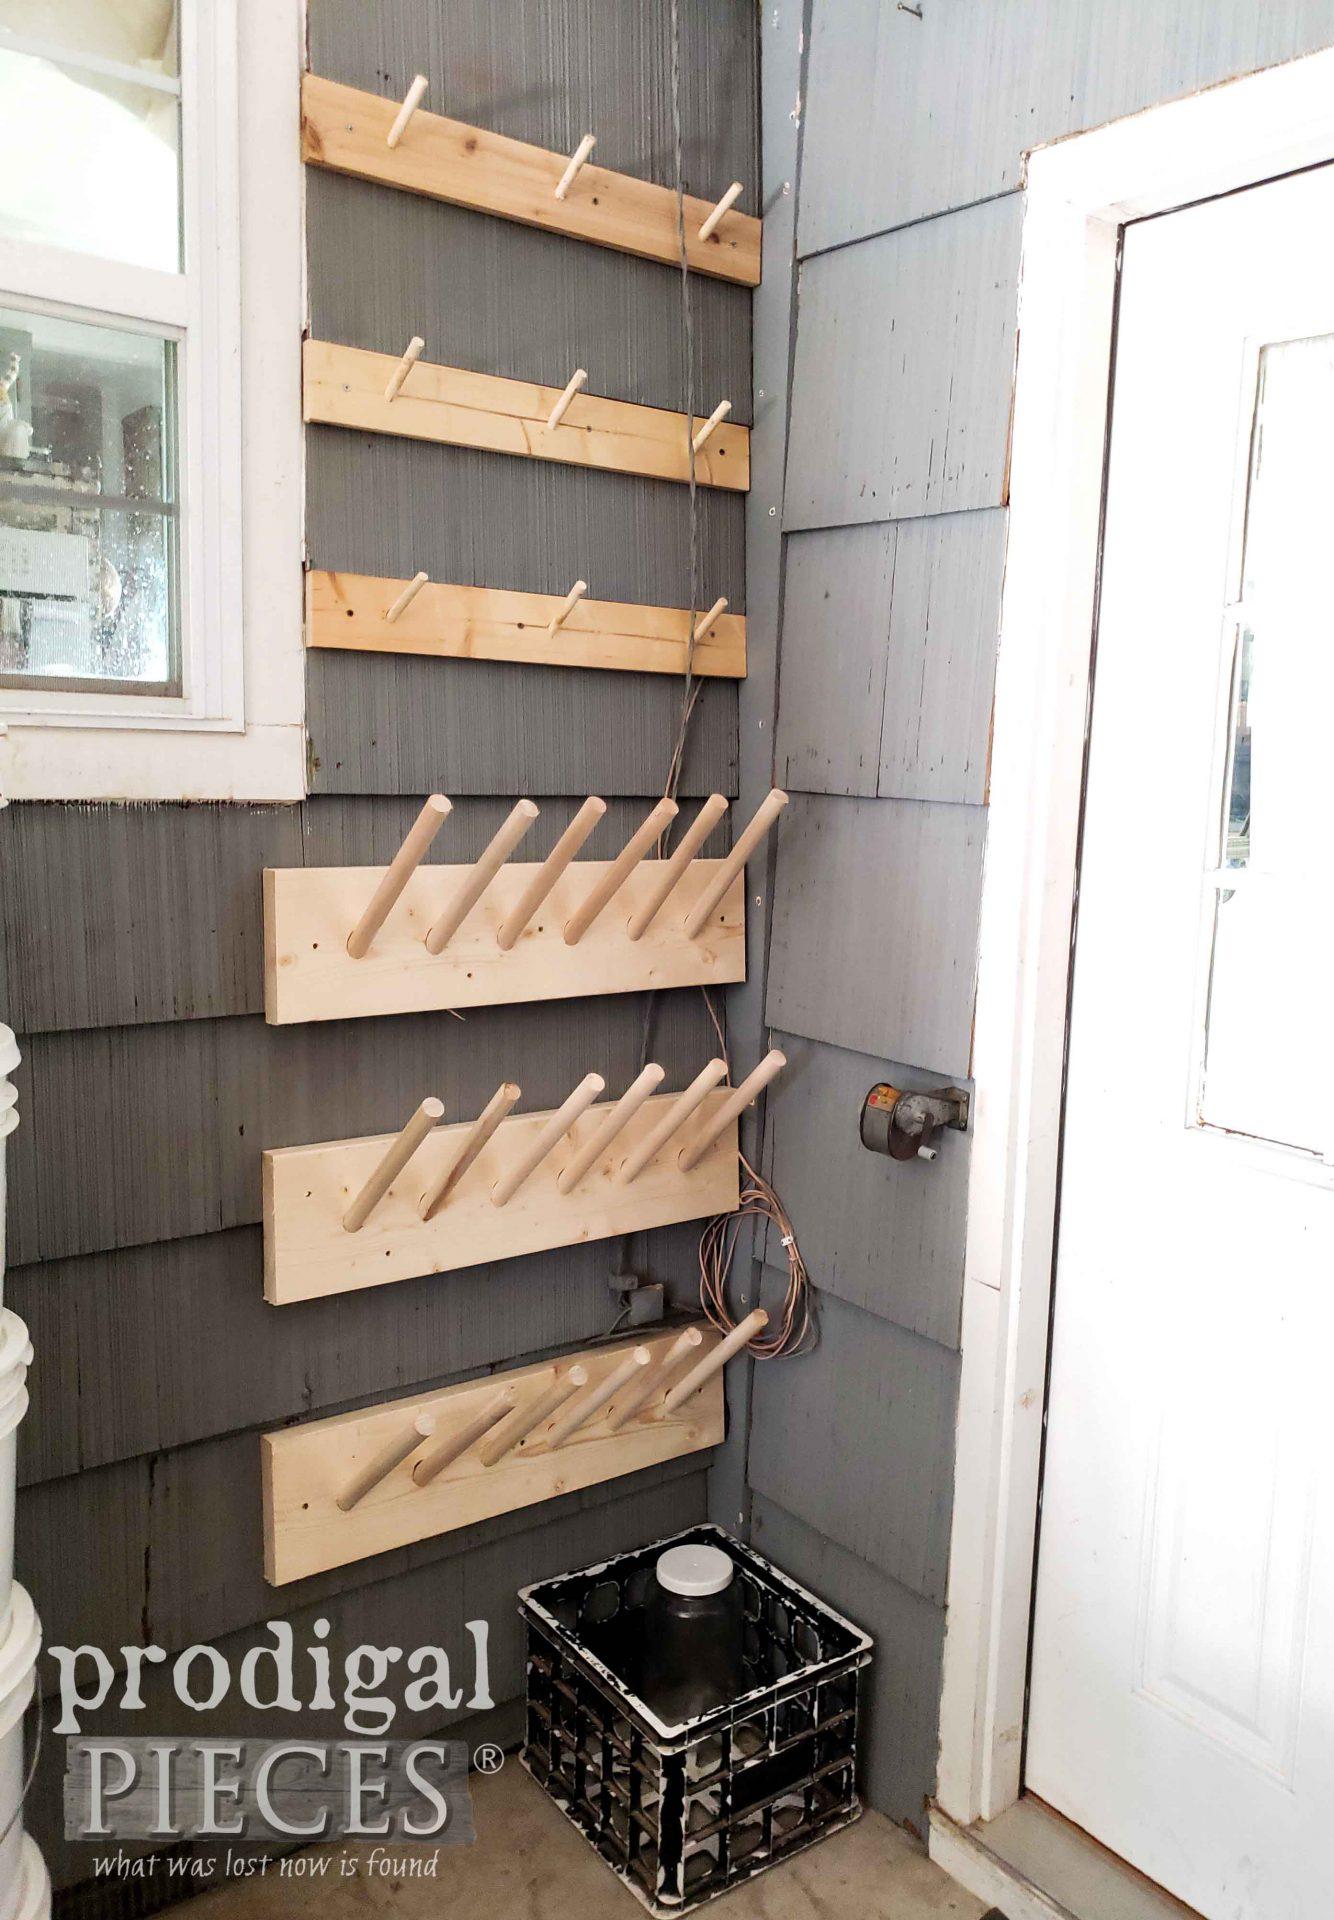 Diy Boot Rack Storage For Sanity S Sake Prodigal Pieces